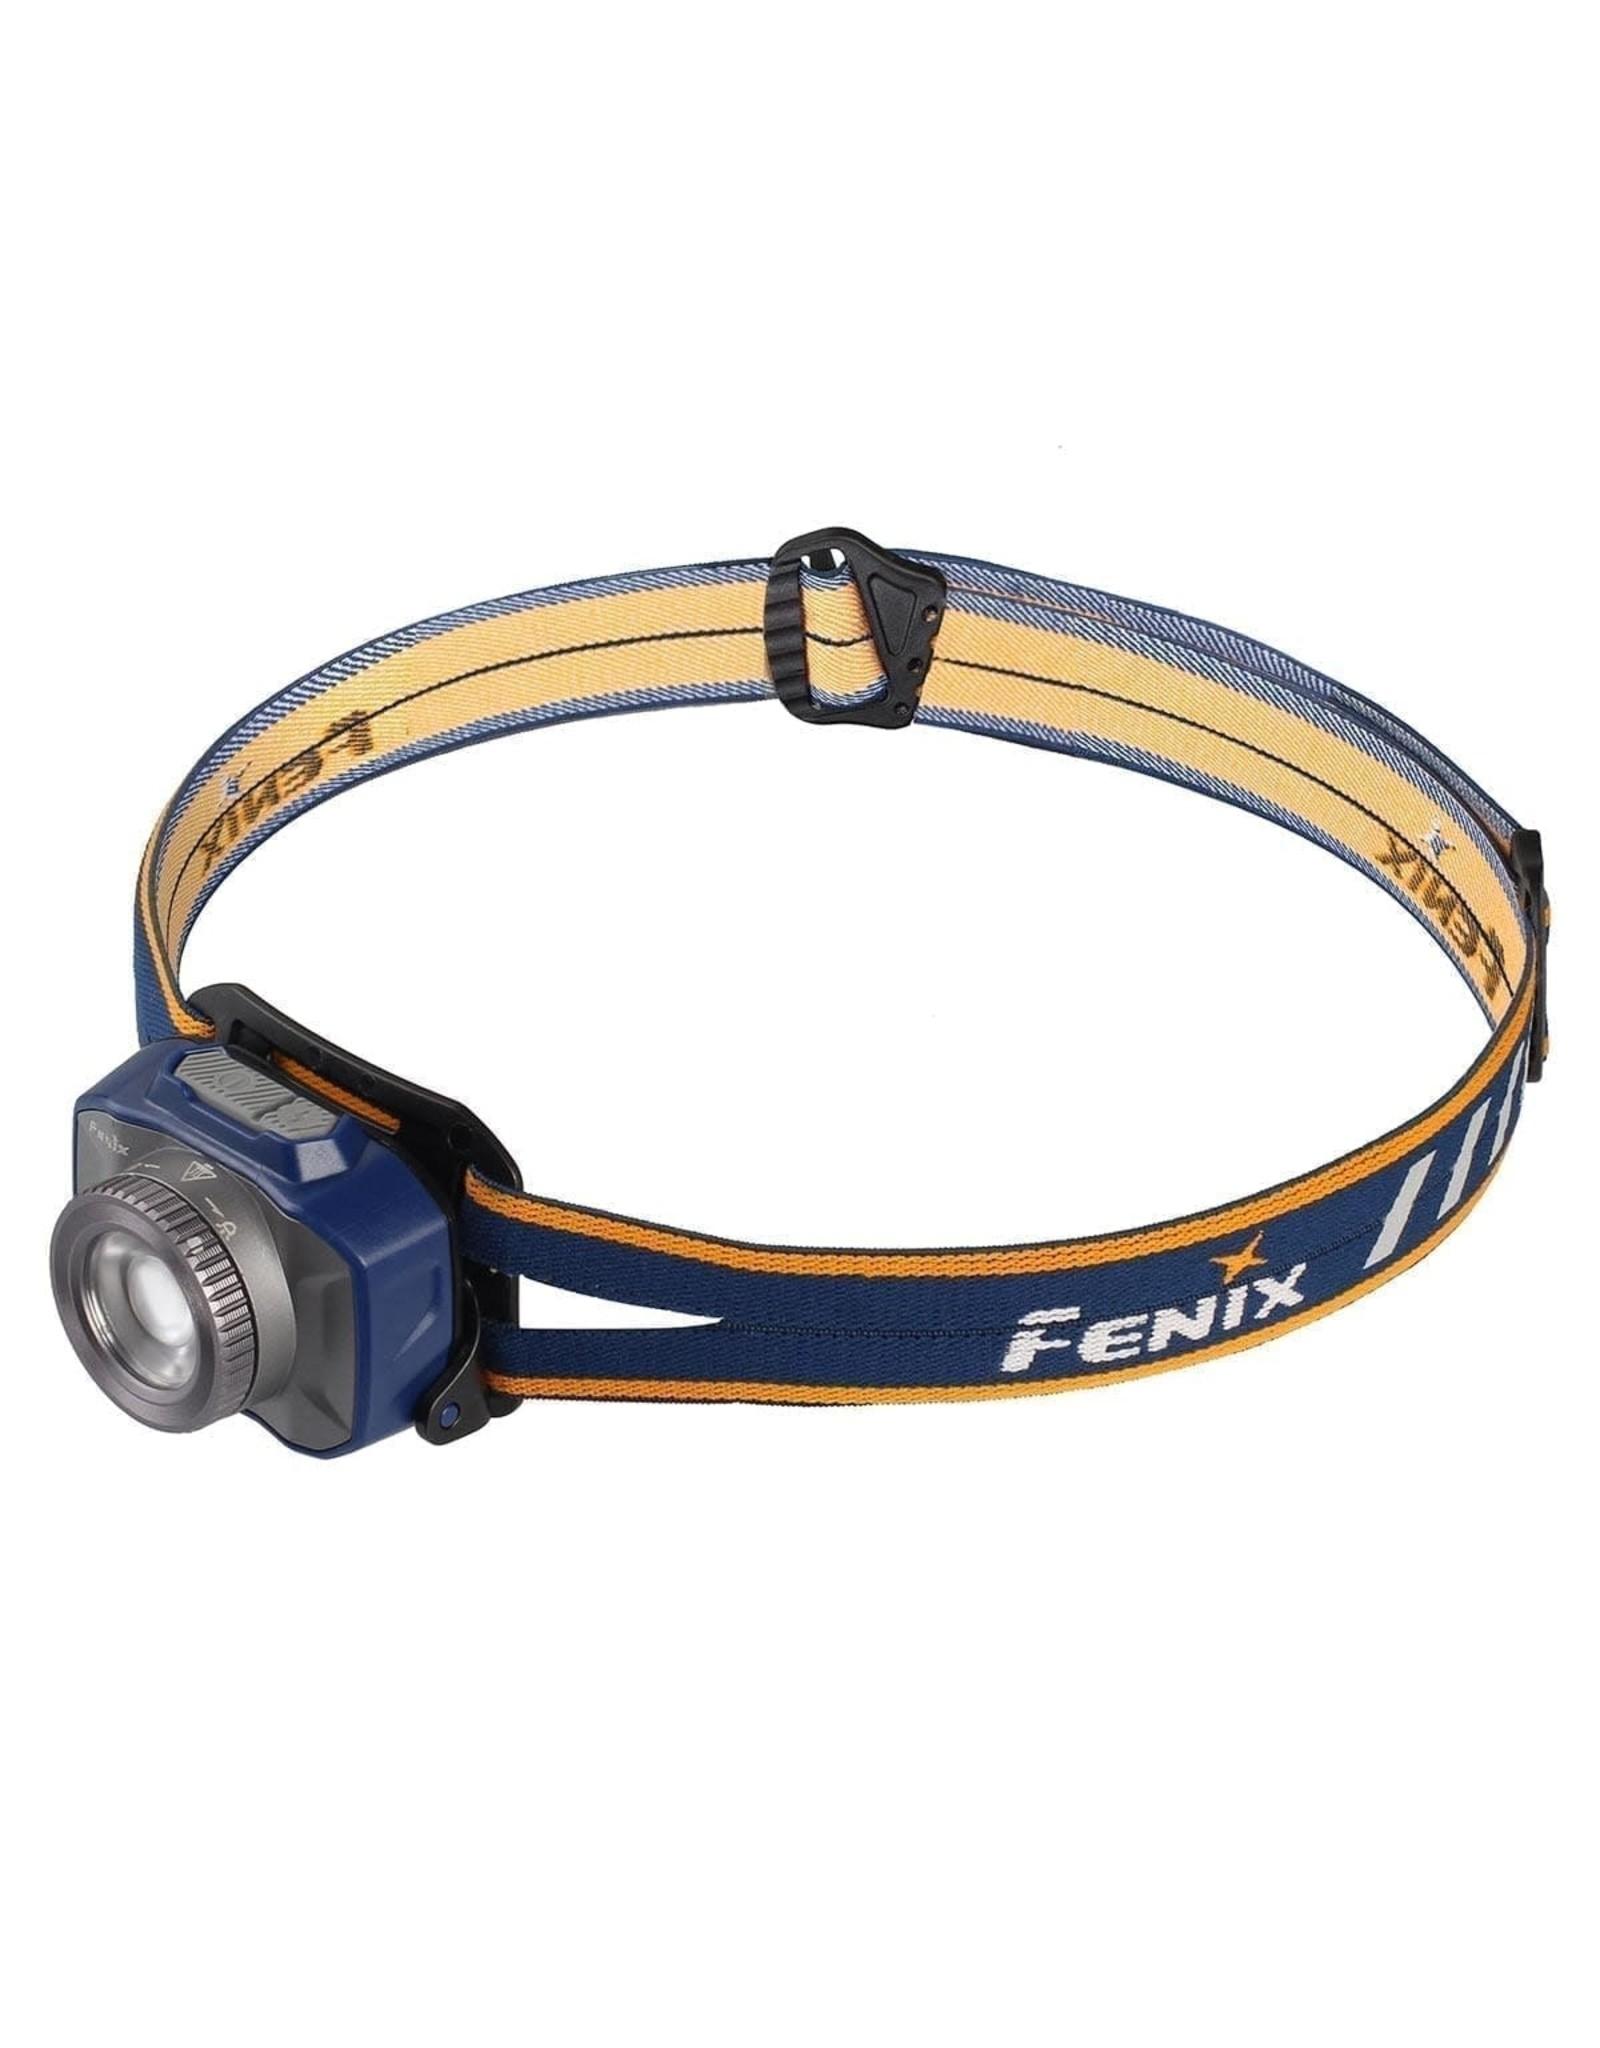 FENIX FENIX HL40R (BLUE) HEADLAMP